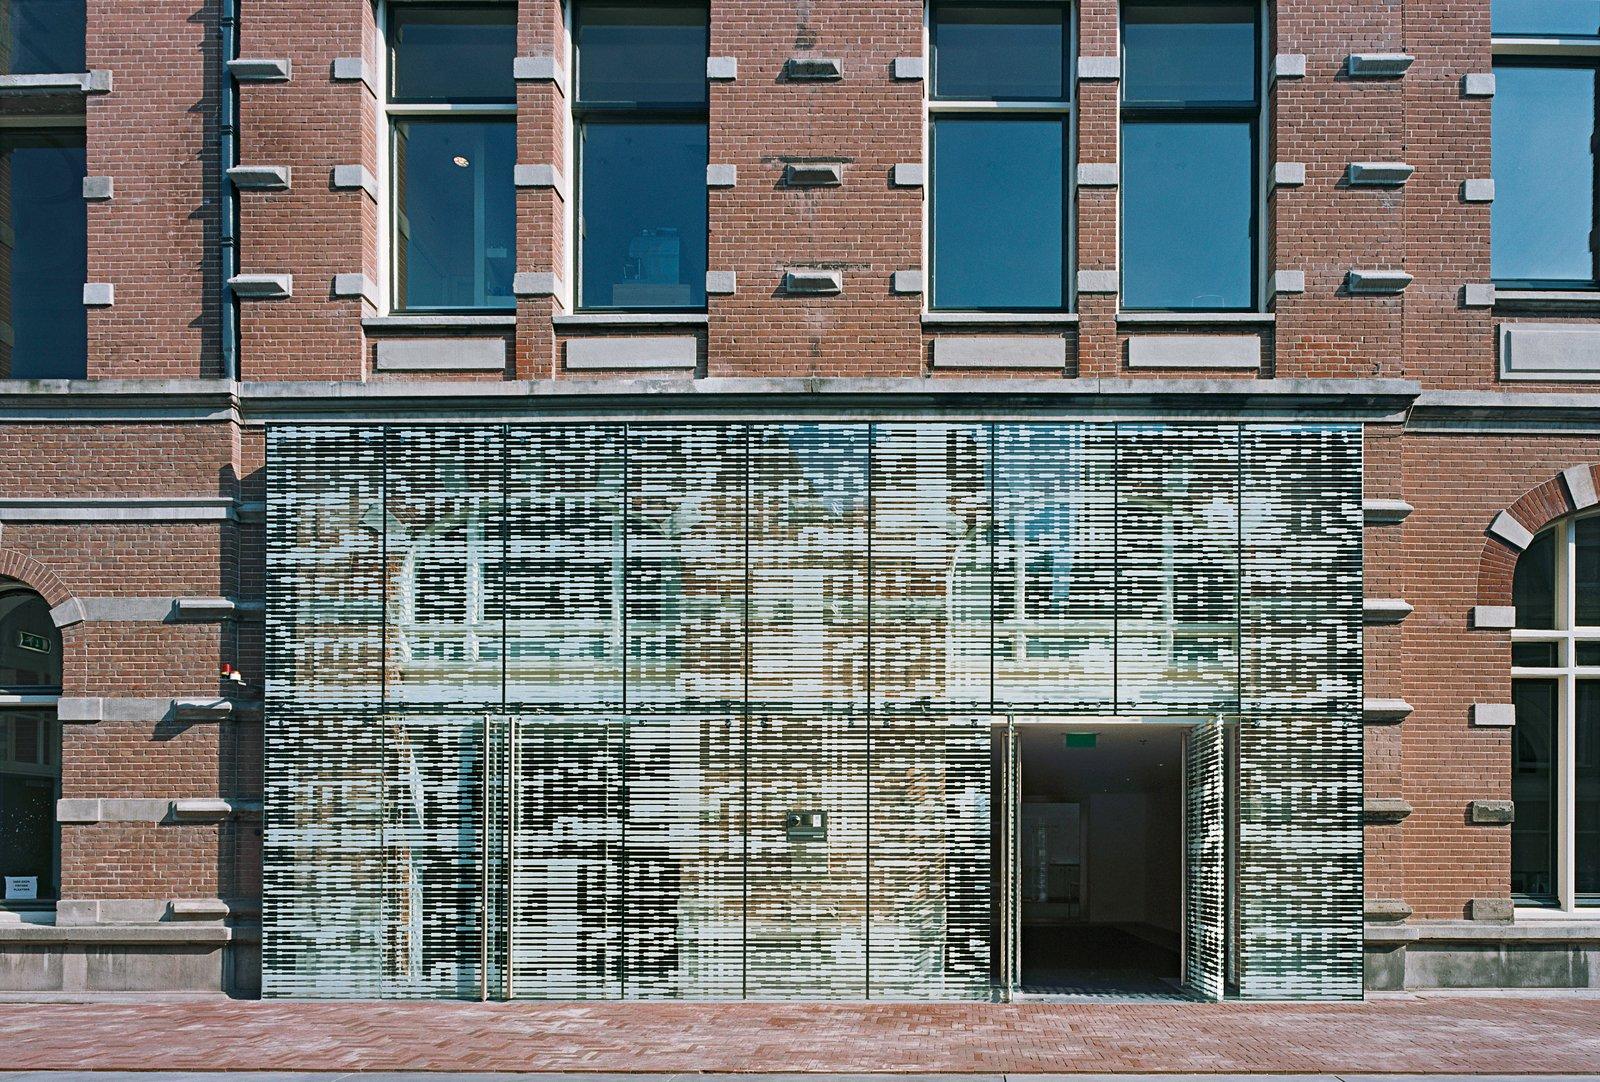 Architecten Cie, Frits van Dongen, Philharmonie, Haarlem  Photo 5 of 18 in Dutch Master